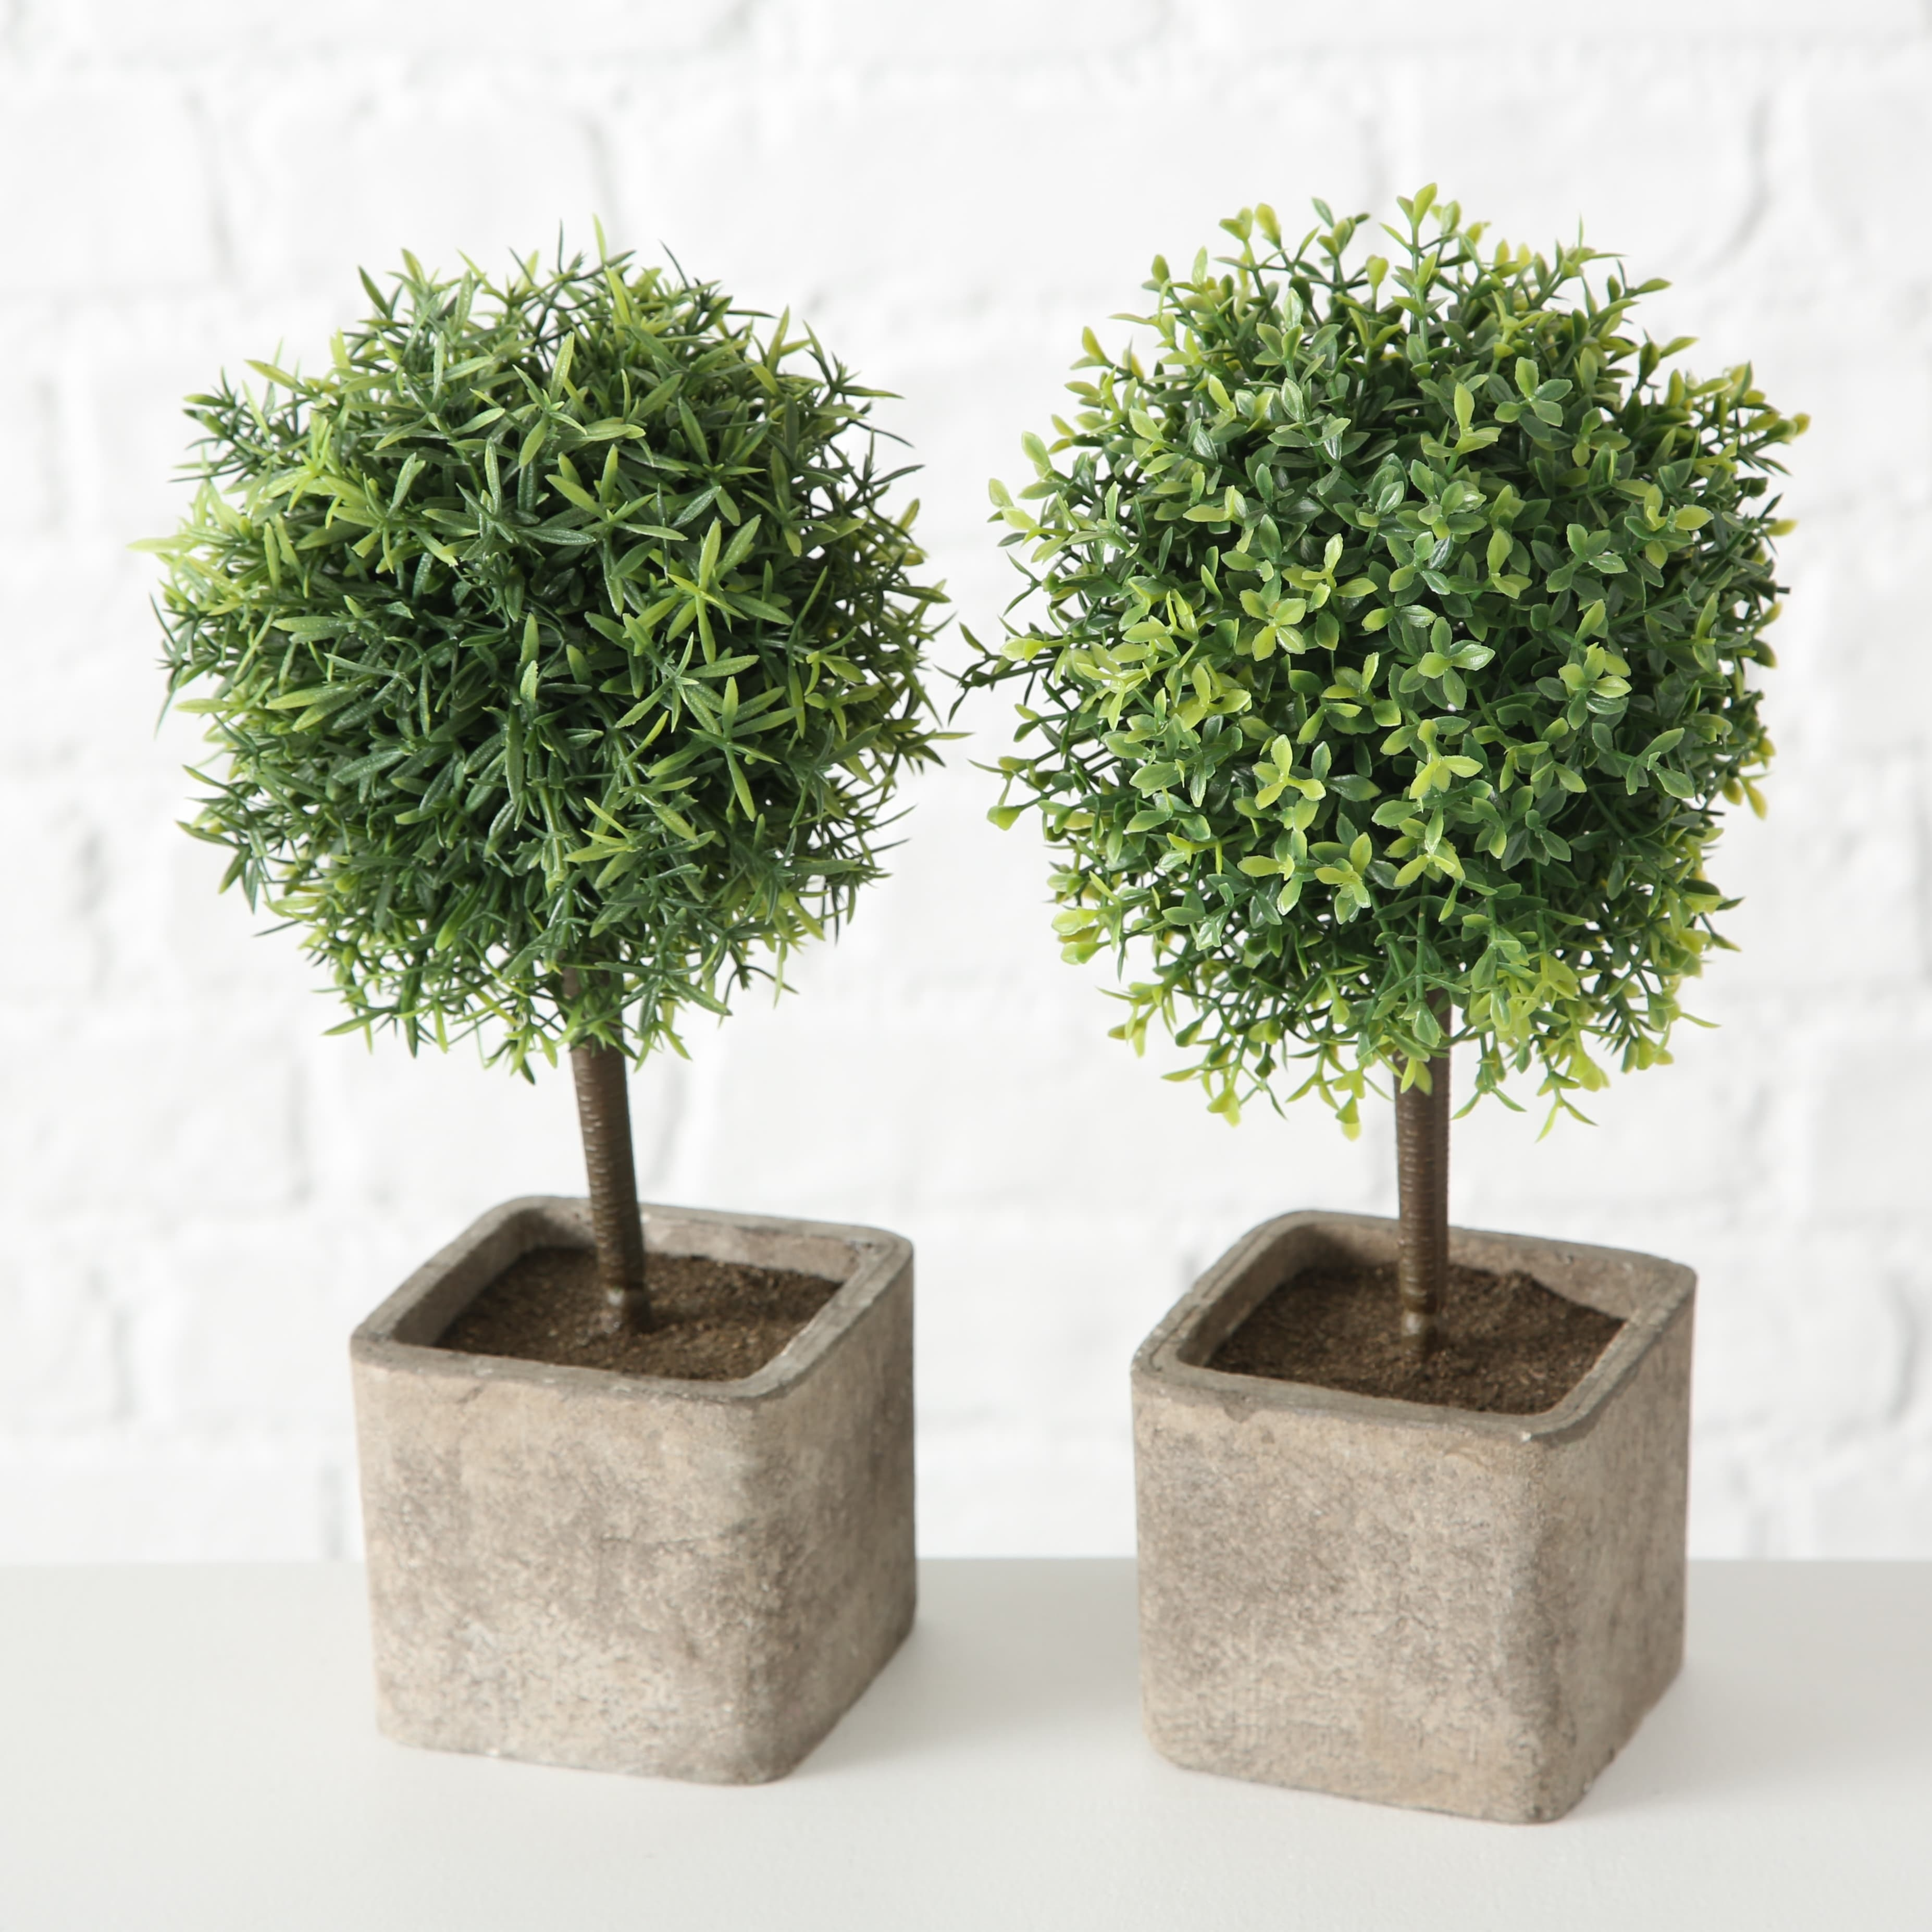 Planta artificiala in ghiveci Indoor Tree Verde / Gri, Modele Asortate, H26 cm